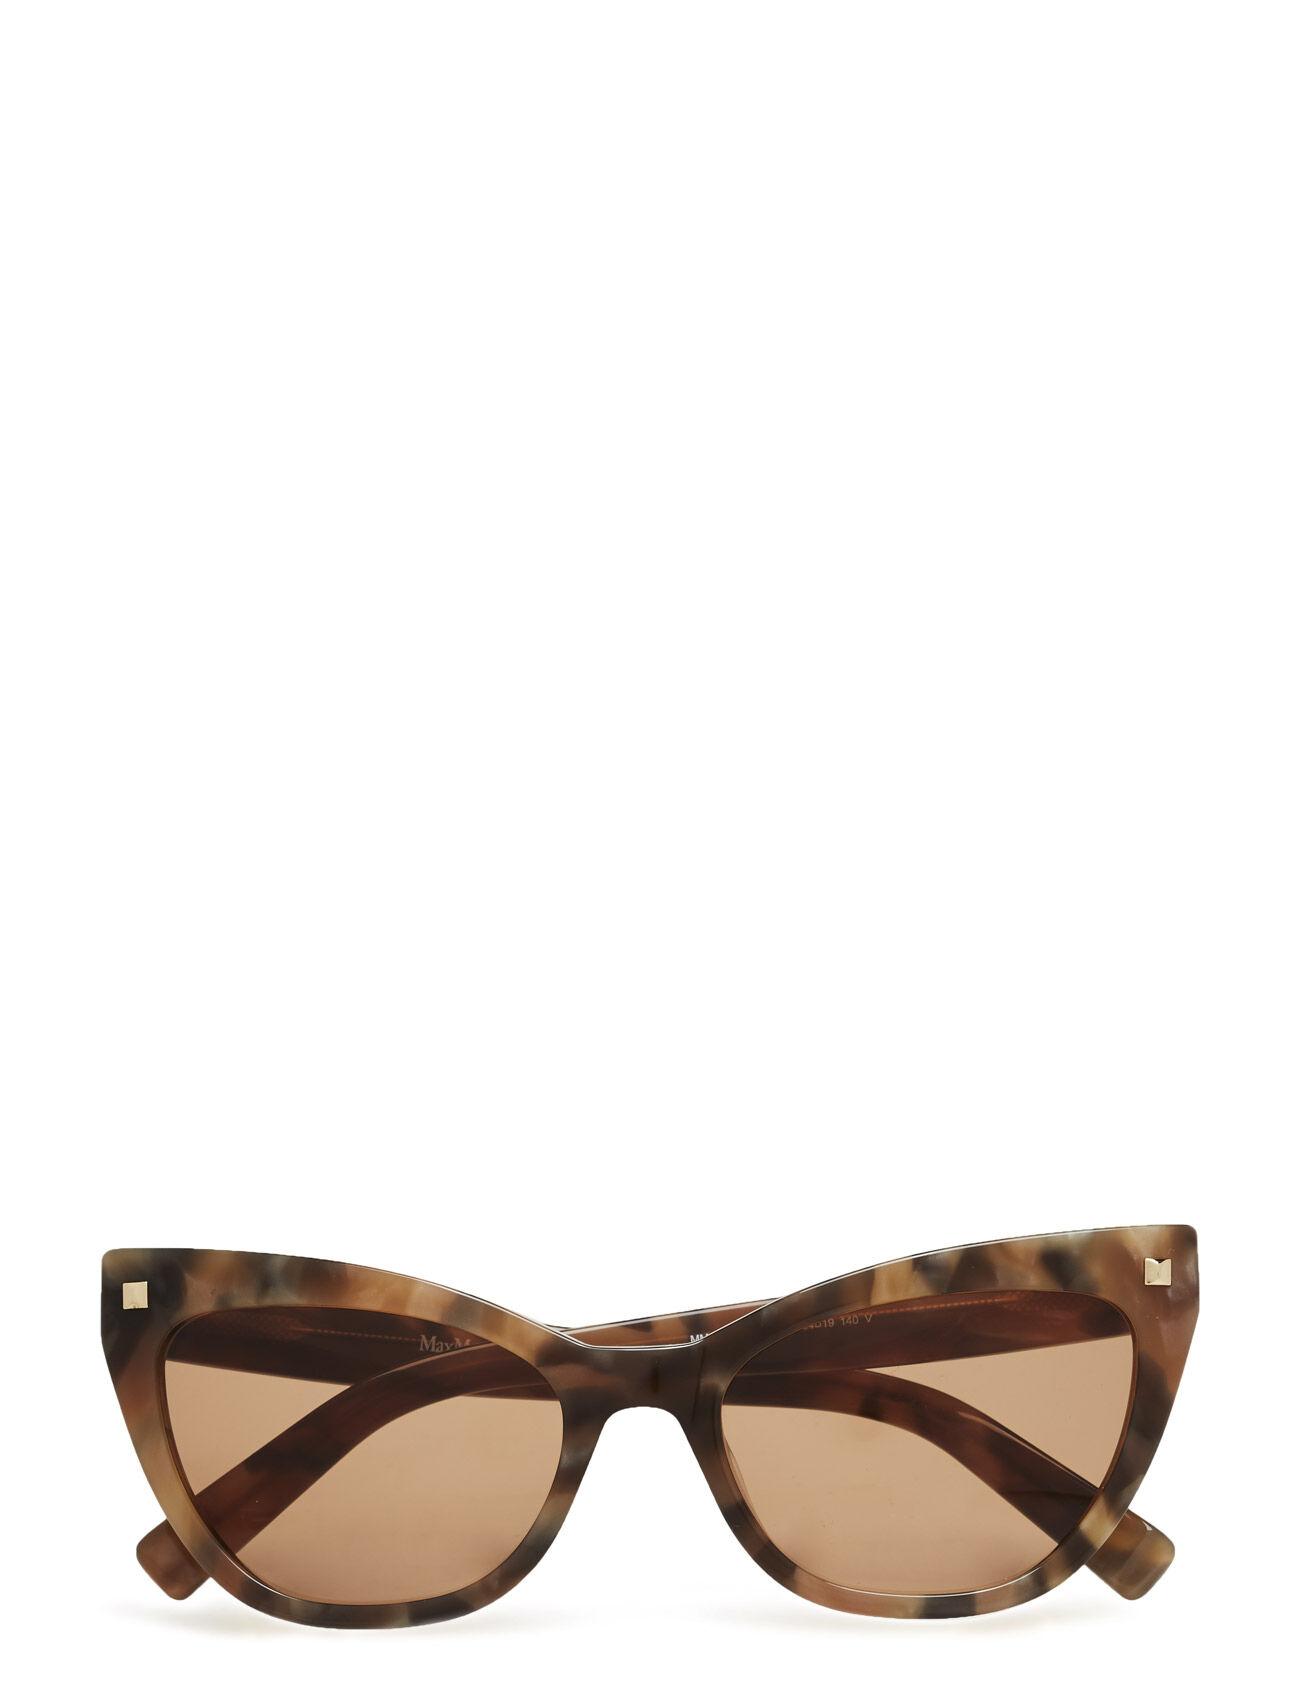 MAXMARA Sunglasses Mm Fifties